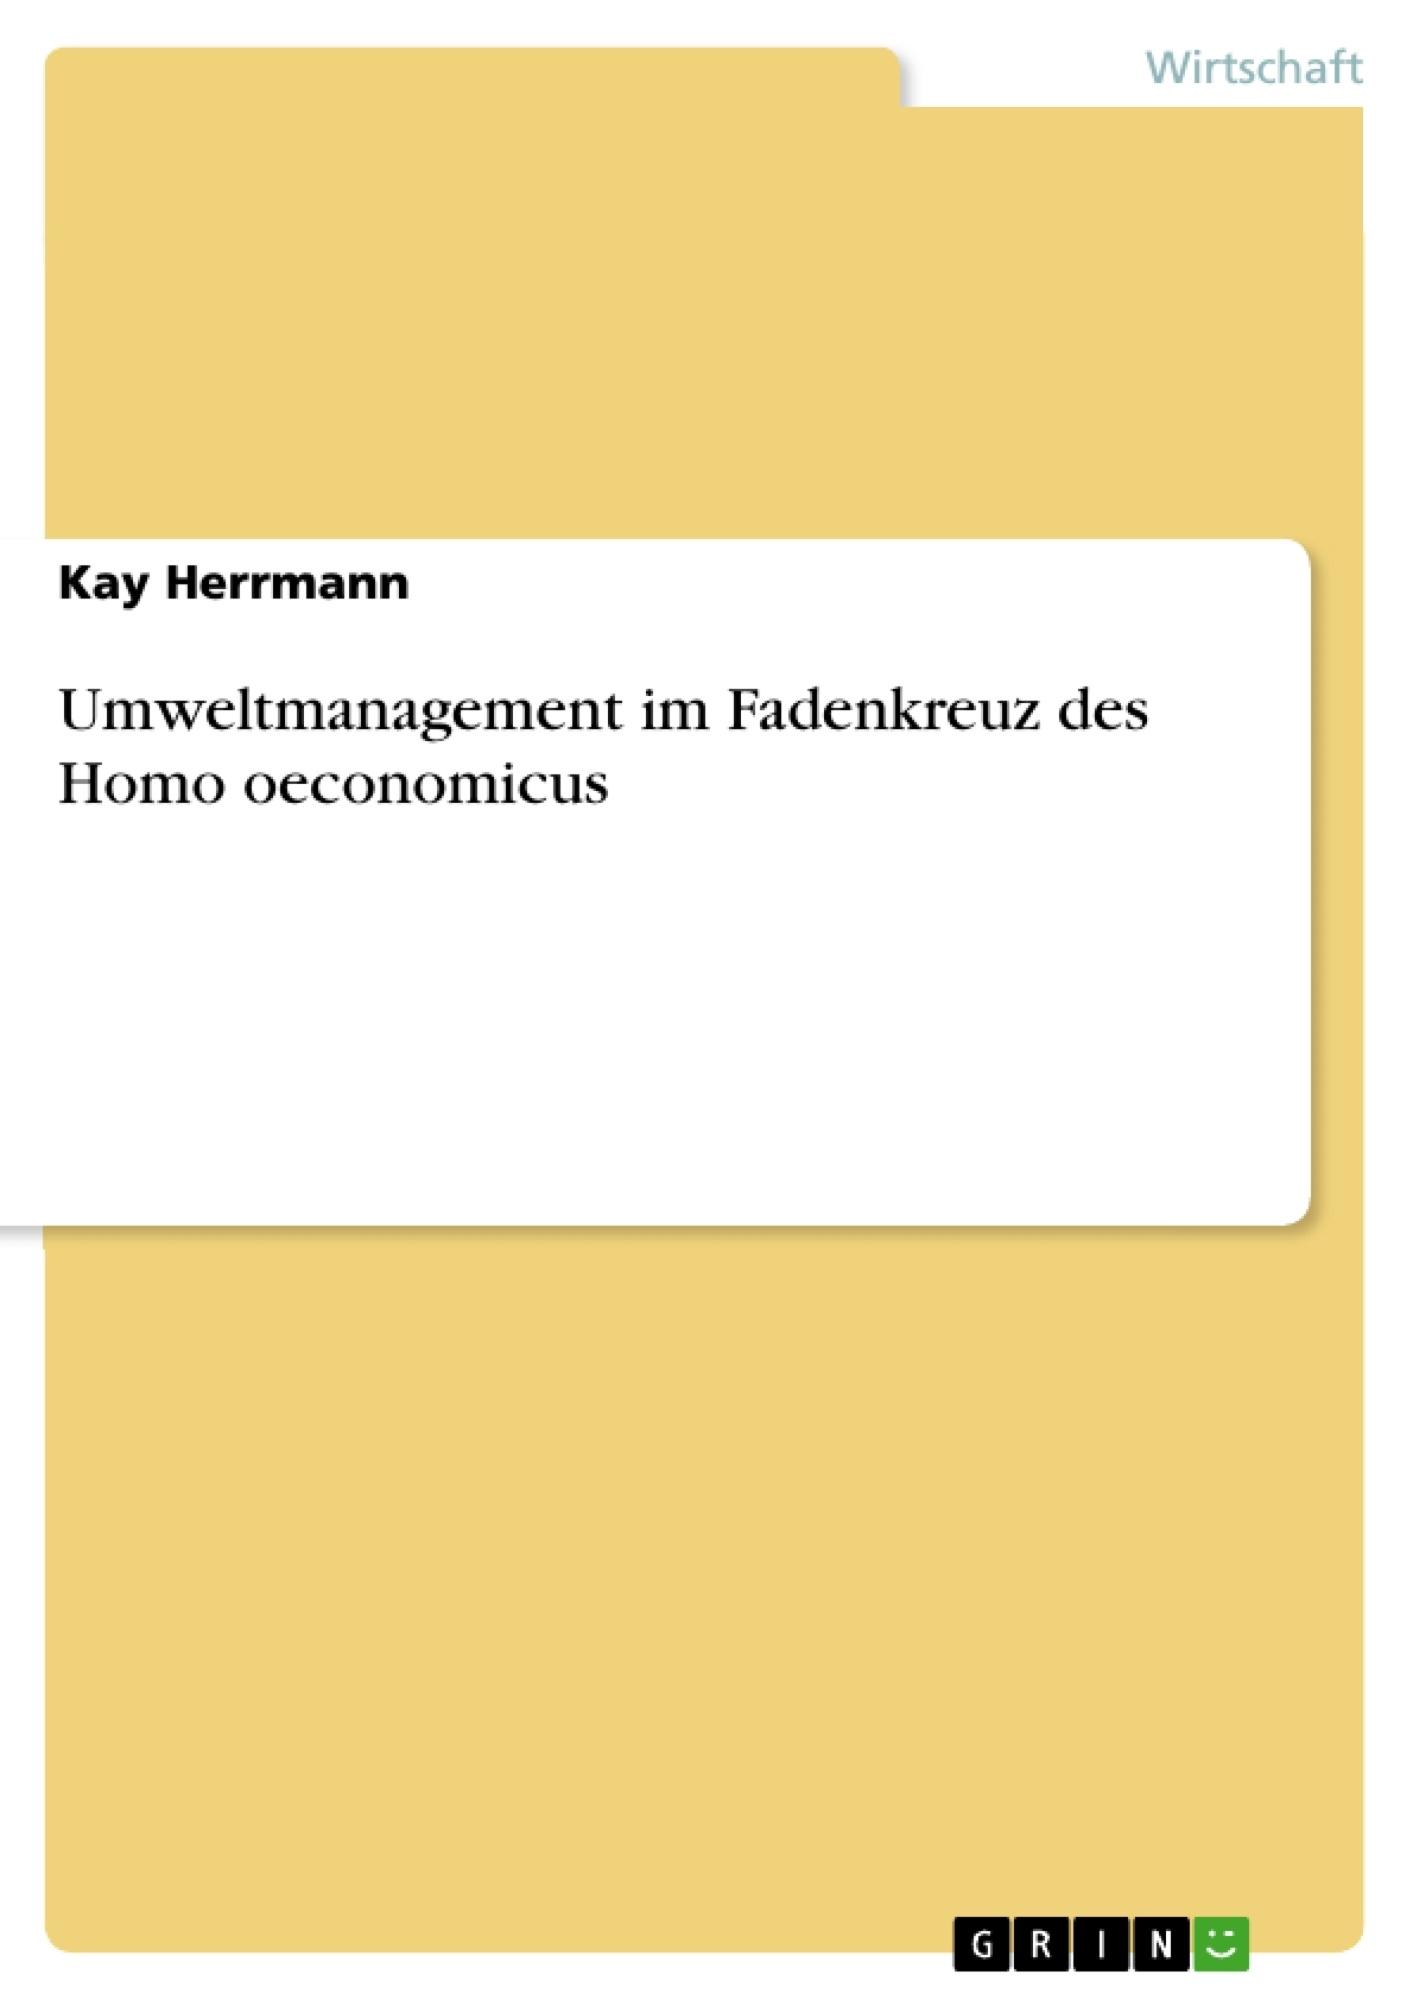 Titel: Umweltmanagement im Fadenkreuz des Homo oeconomicus